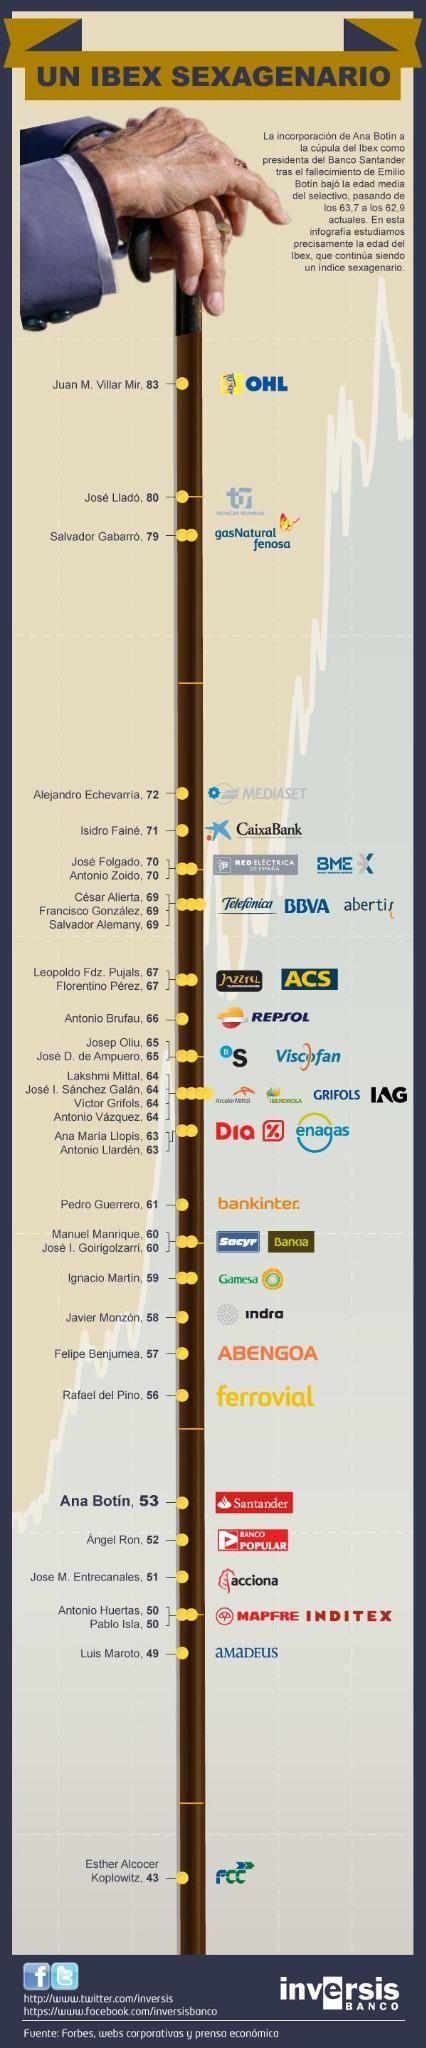 Infografia. Las edades de los dirigentes del Ibex 35